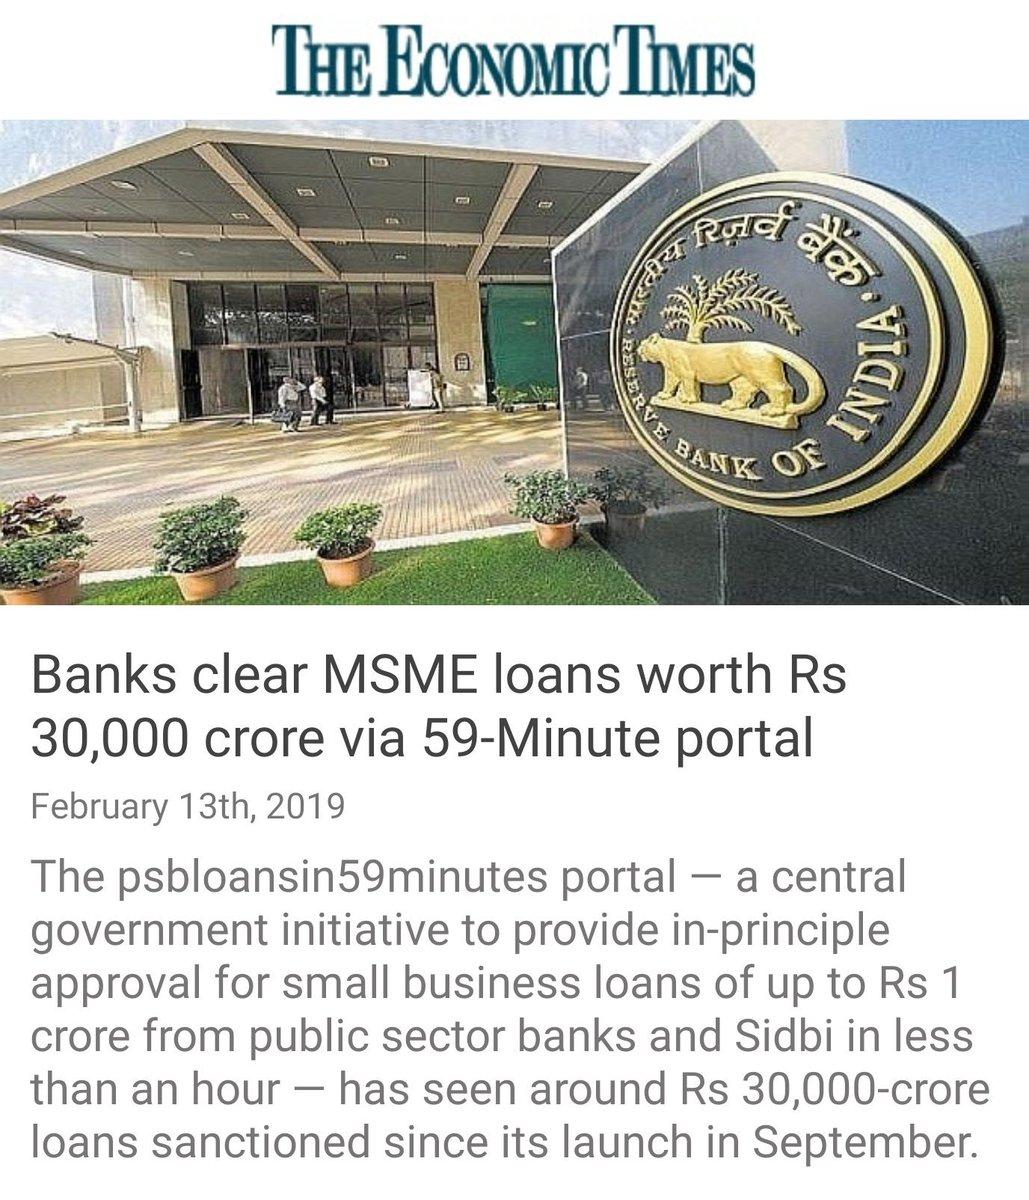 Banks clear MSME loans worth Rs 30,000 crore via 59-Minute portal https://economictimes.indiatimes.com/small-biz/startups/newsbuzz/banks-clear-msme-loans-worth-rs-30000-crore-via-59-minute-portal/articleshow/67966428.cms?from=mdr…  via NaMo App